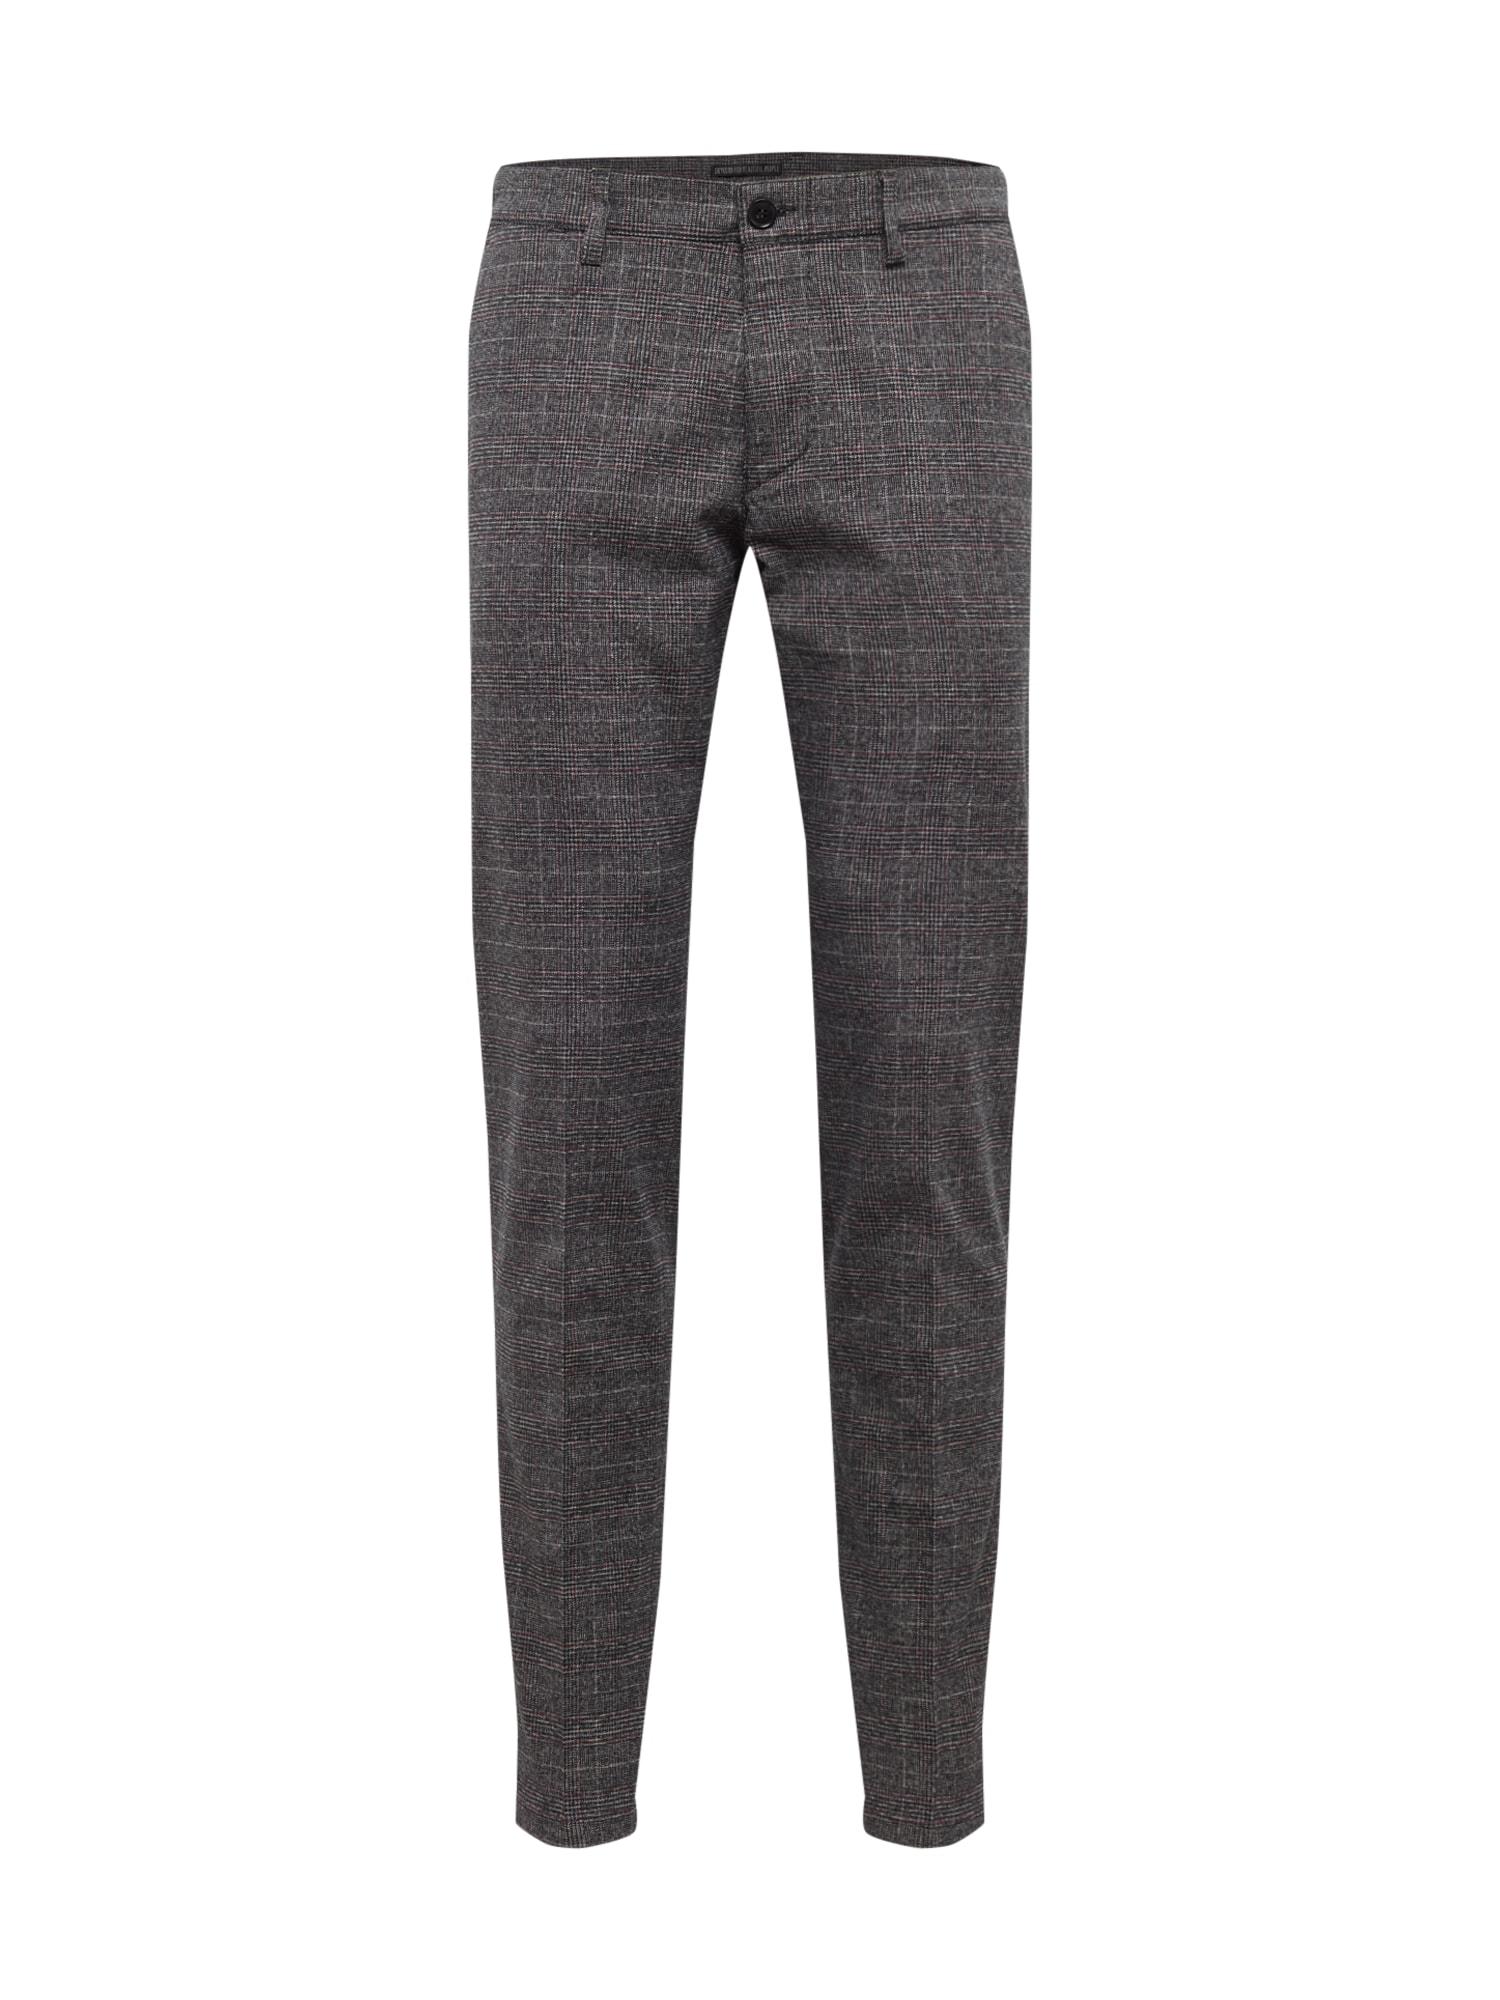 Chino kalhoty MAD tmavě šedá DRYKORN